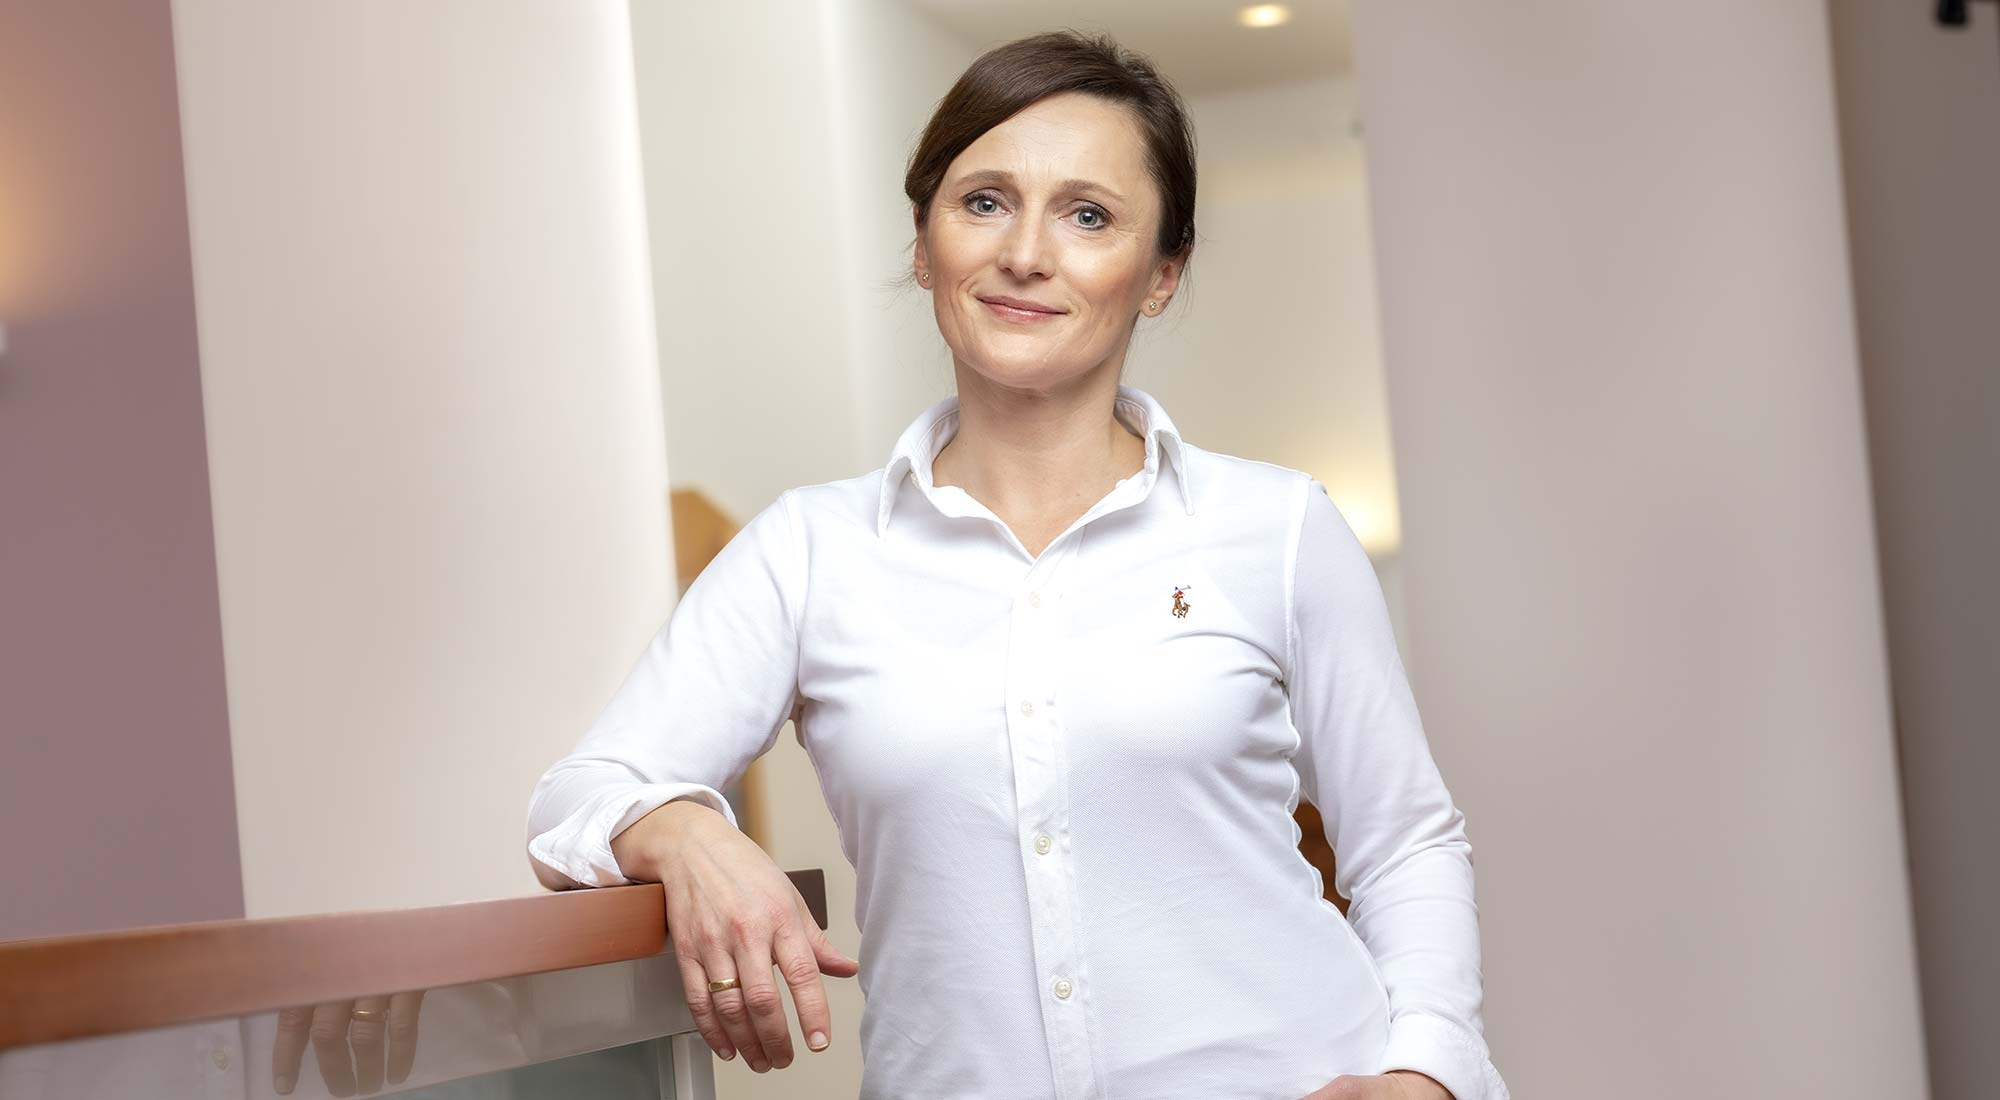 Tumornachsorge Gynäkologie im Medipark Osnabrück